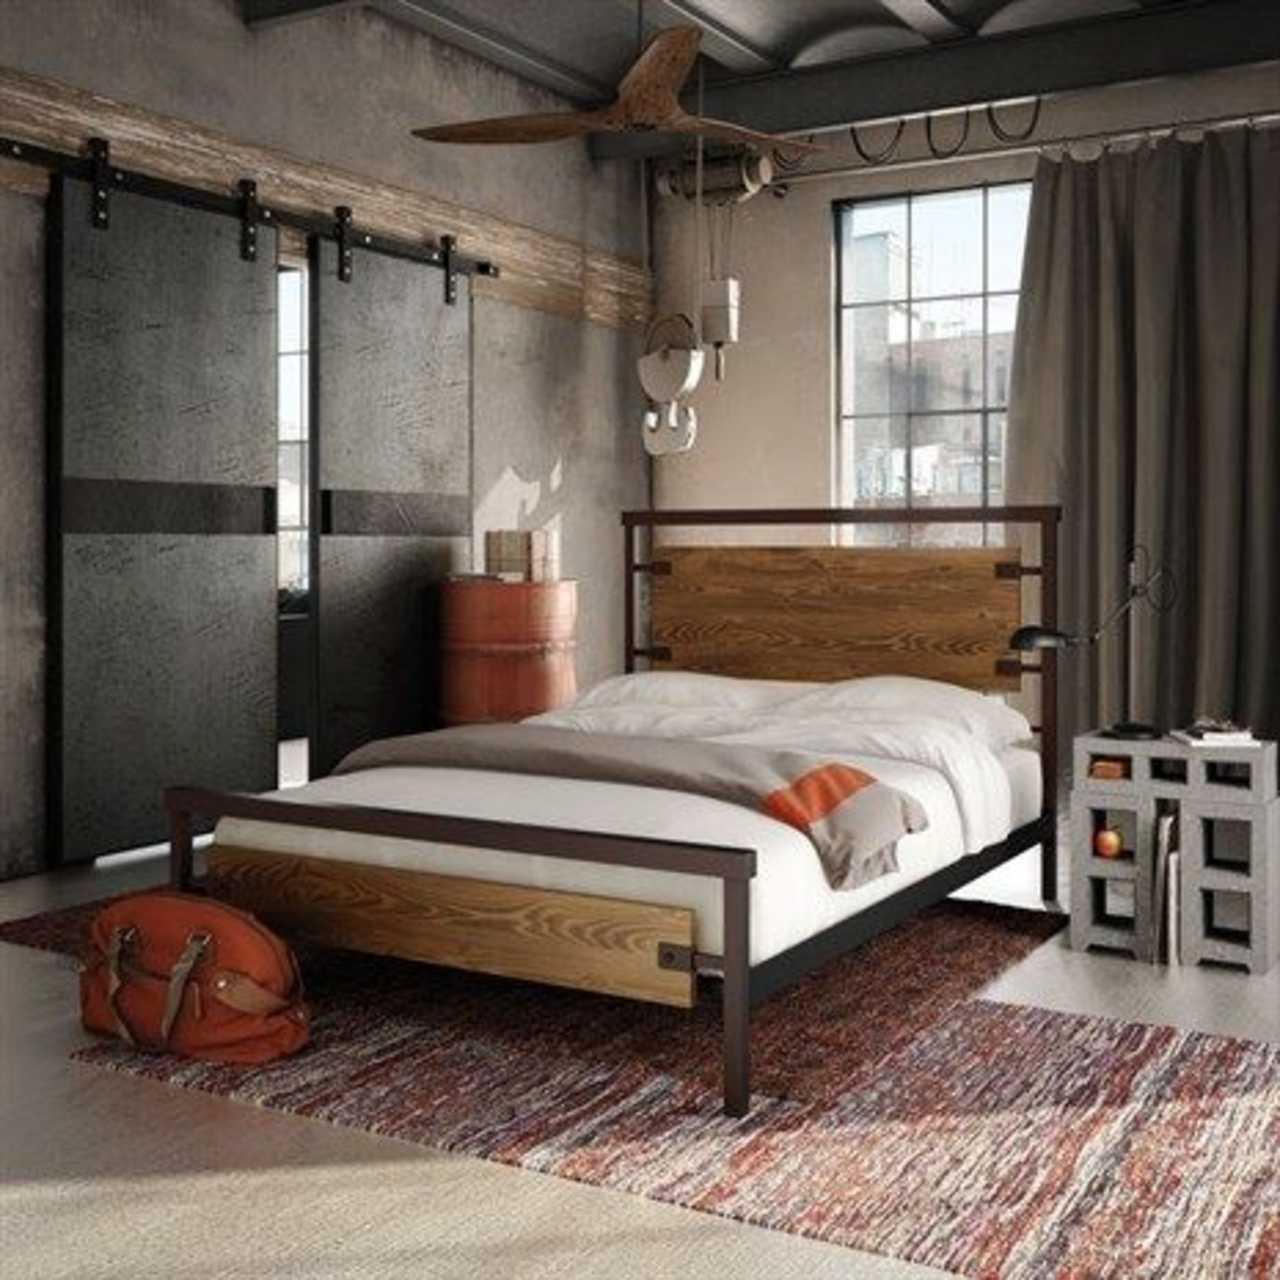 Snugglers Furniture - Shopping - Furniture in Waterloo ON